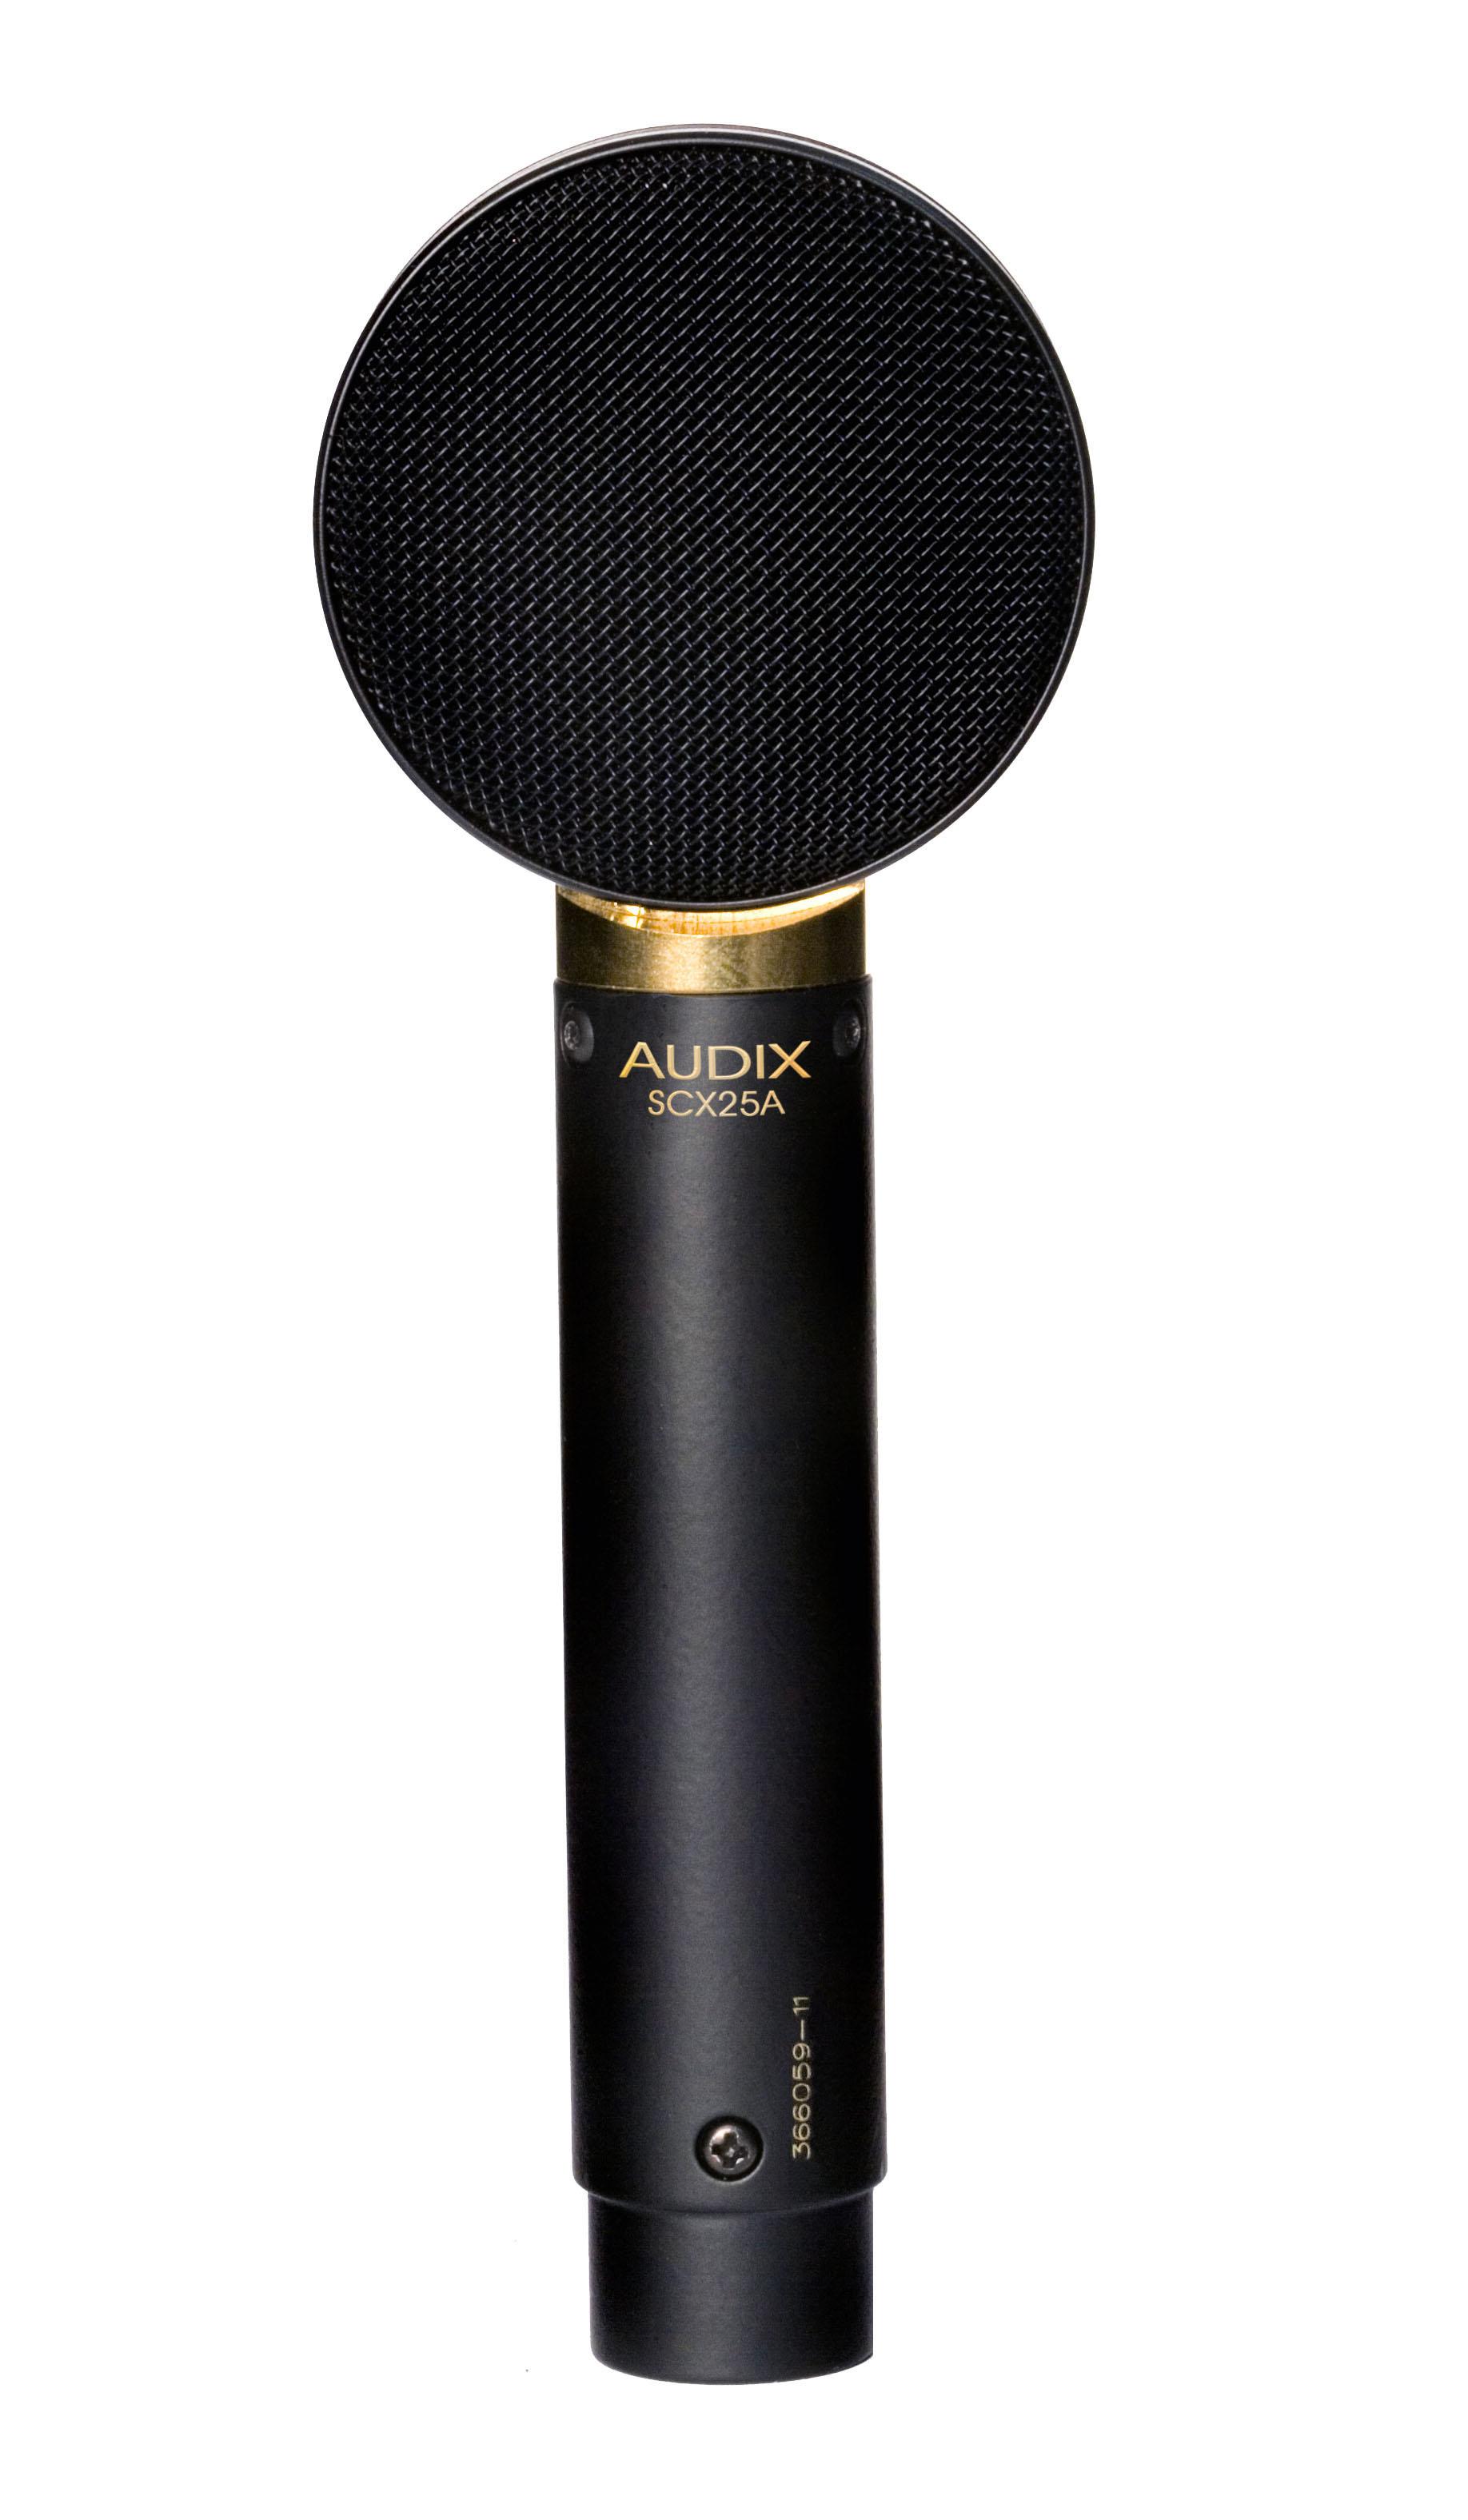 Audix SCX25A Studio Condenser Microphone, Large Diagphram